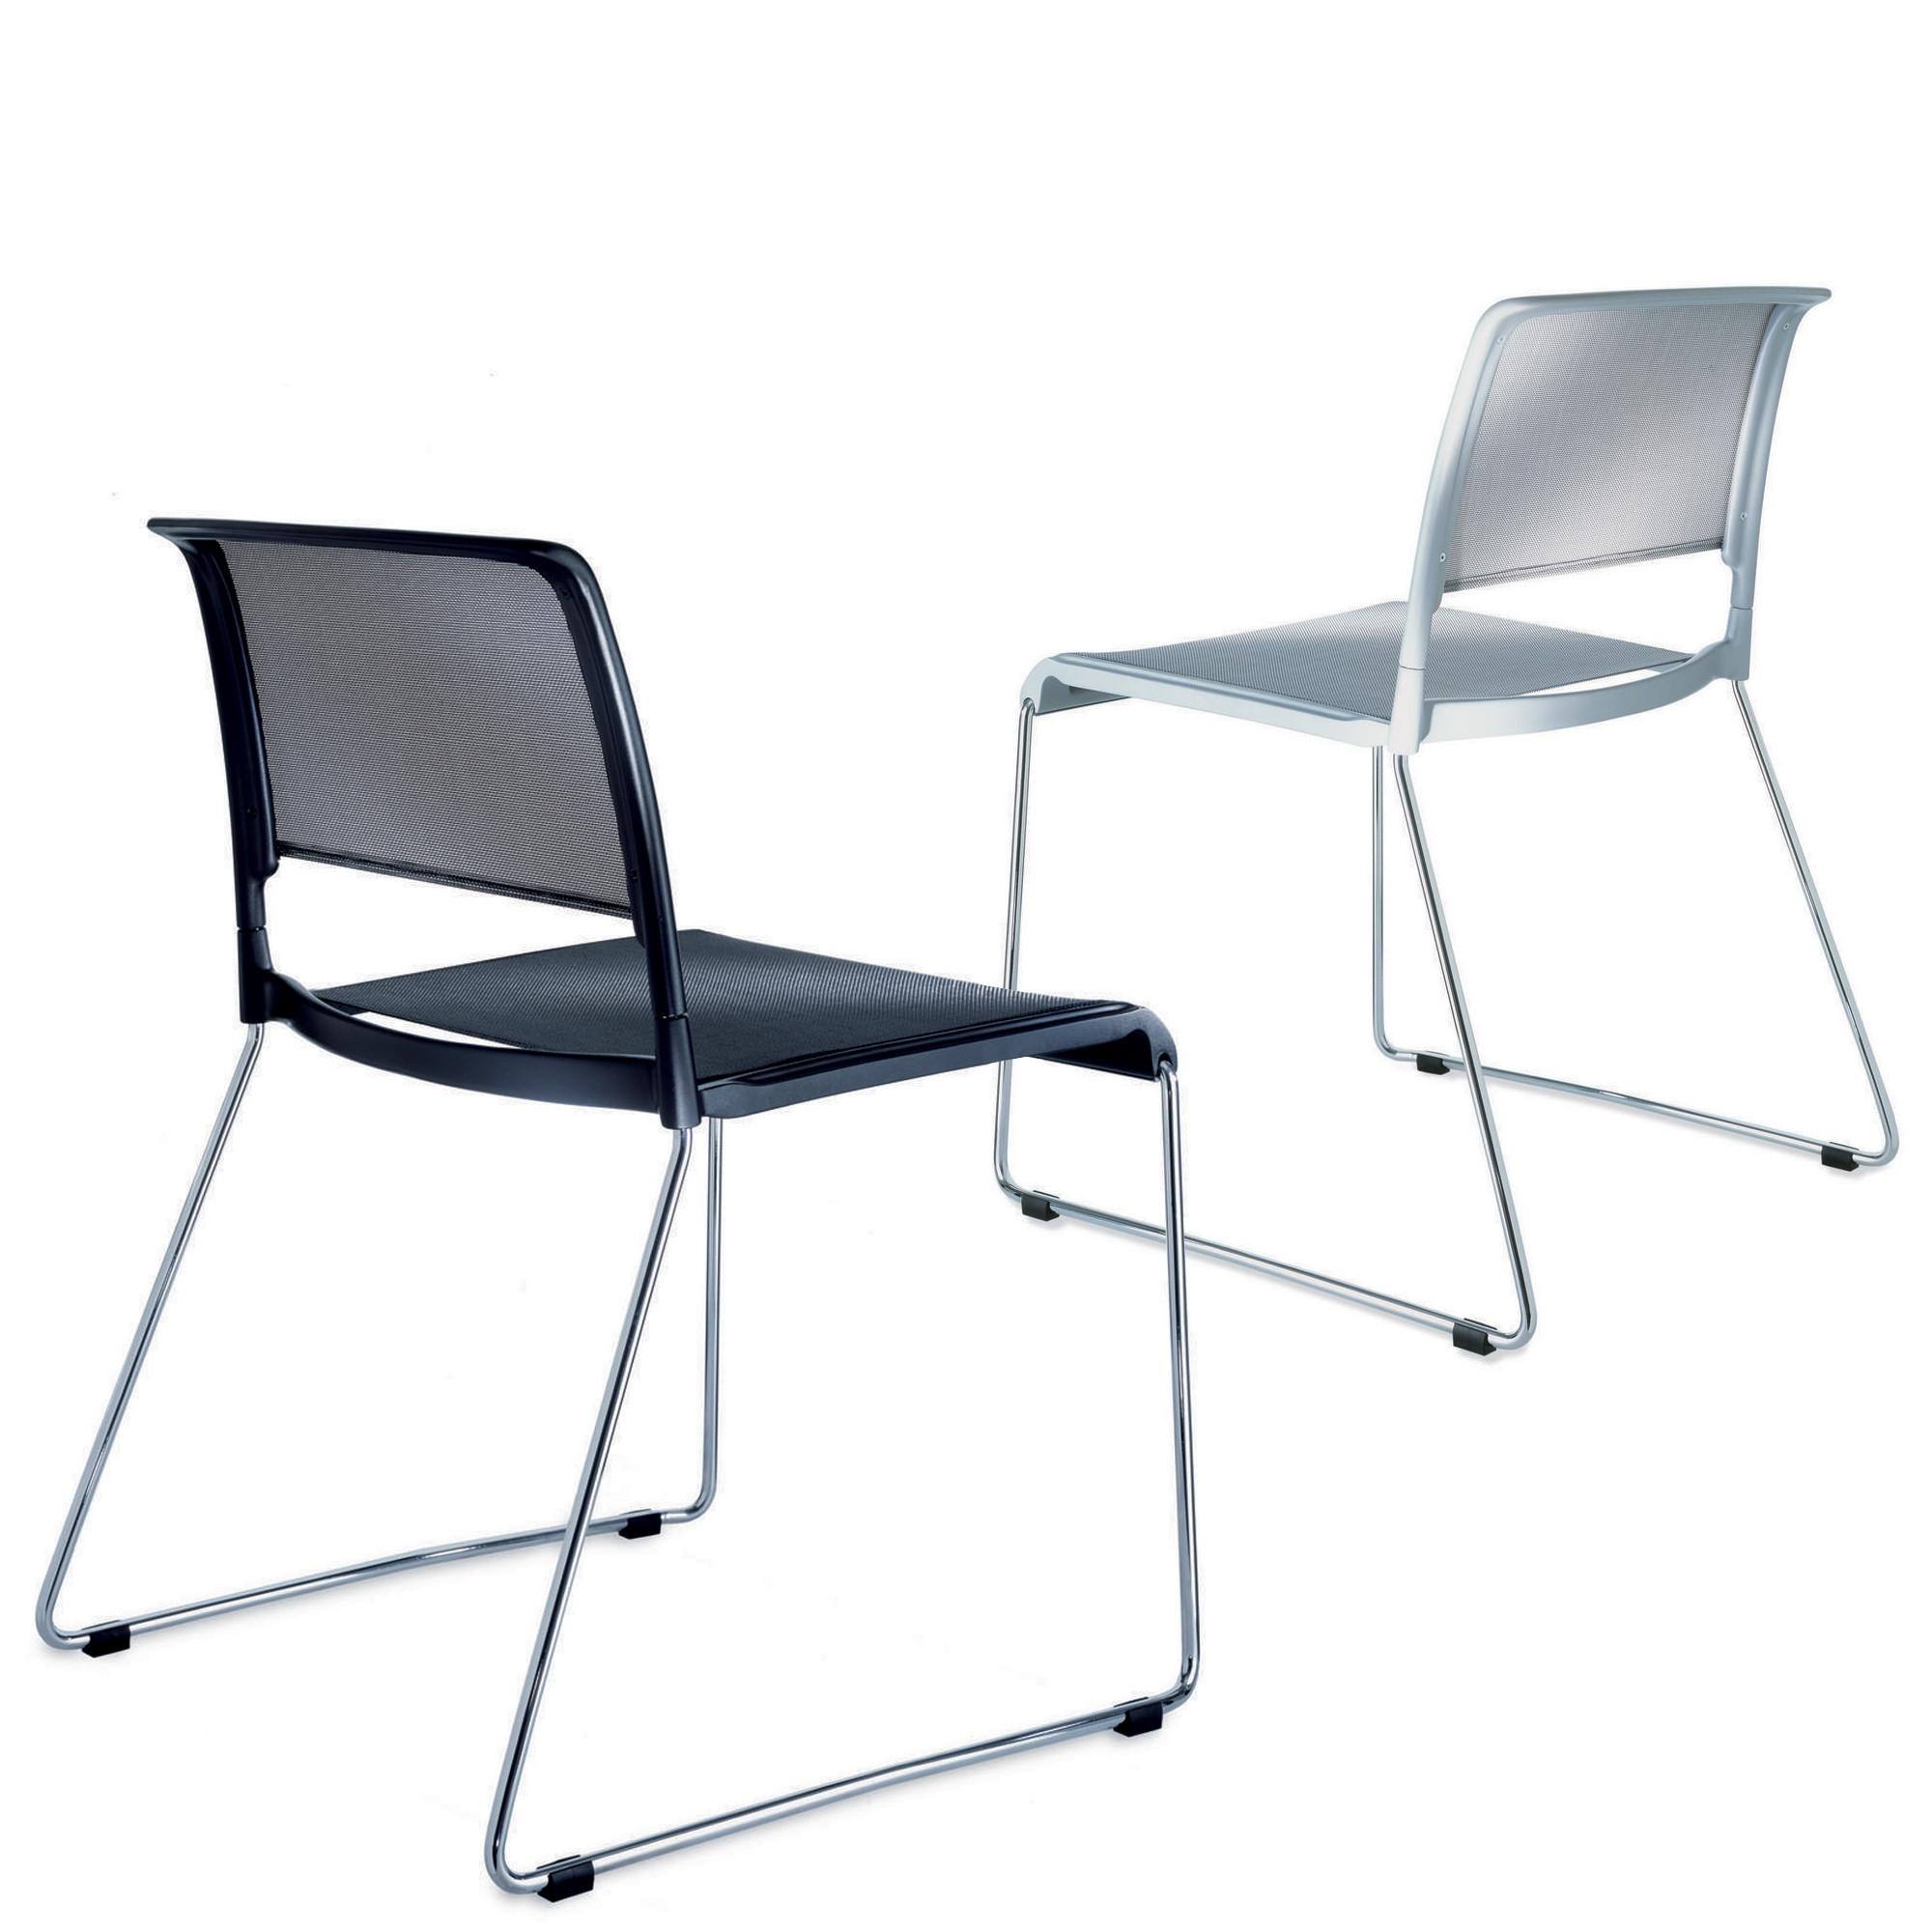 Aline Skid-Base Chairs